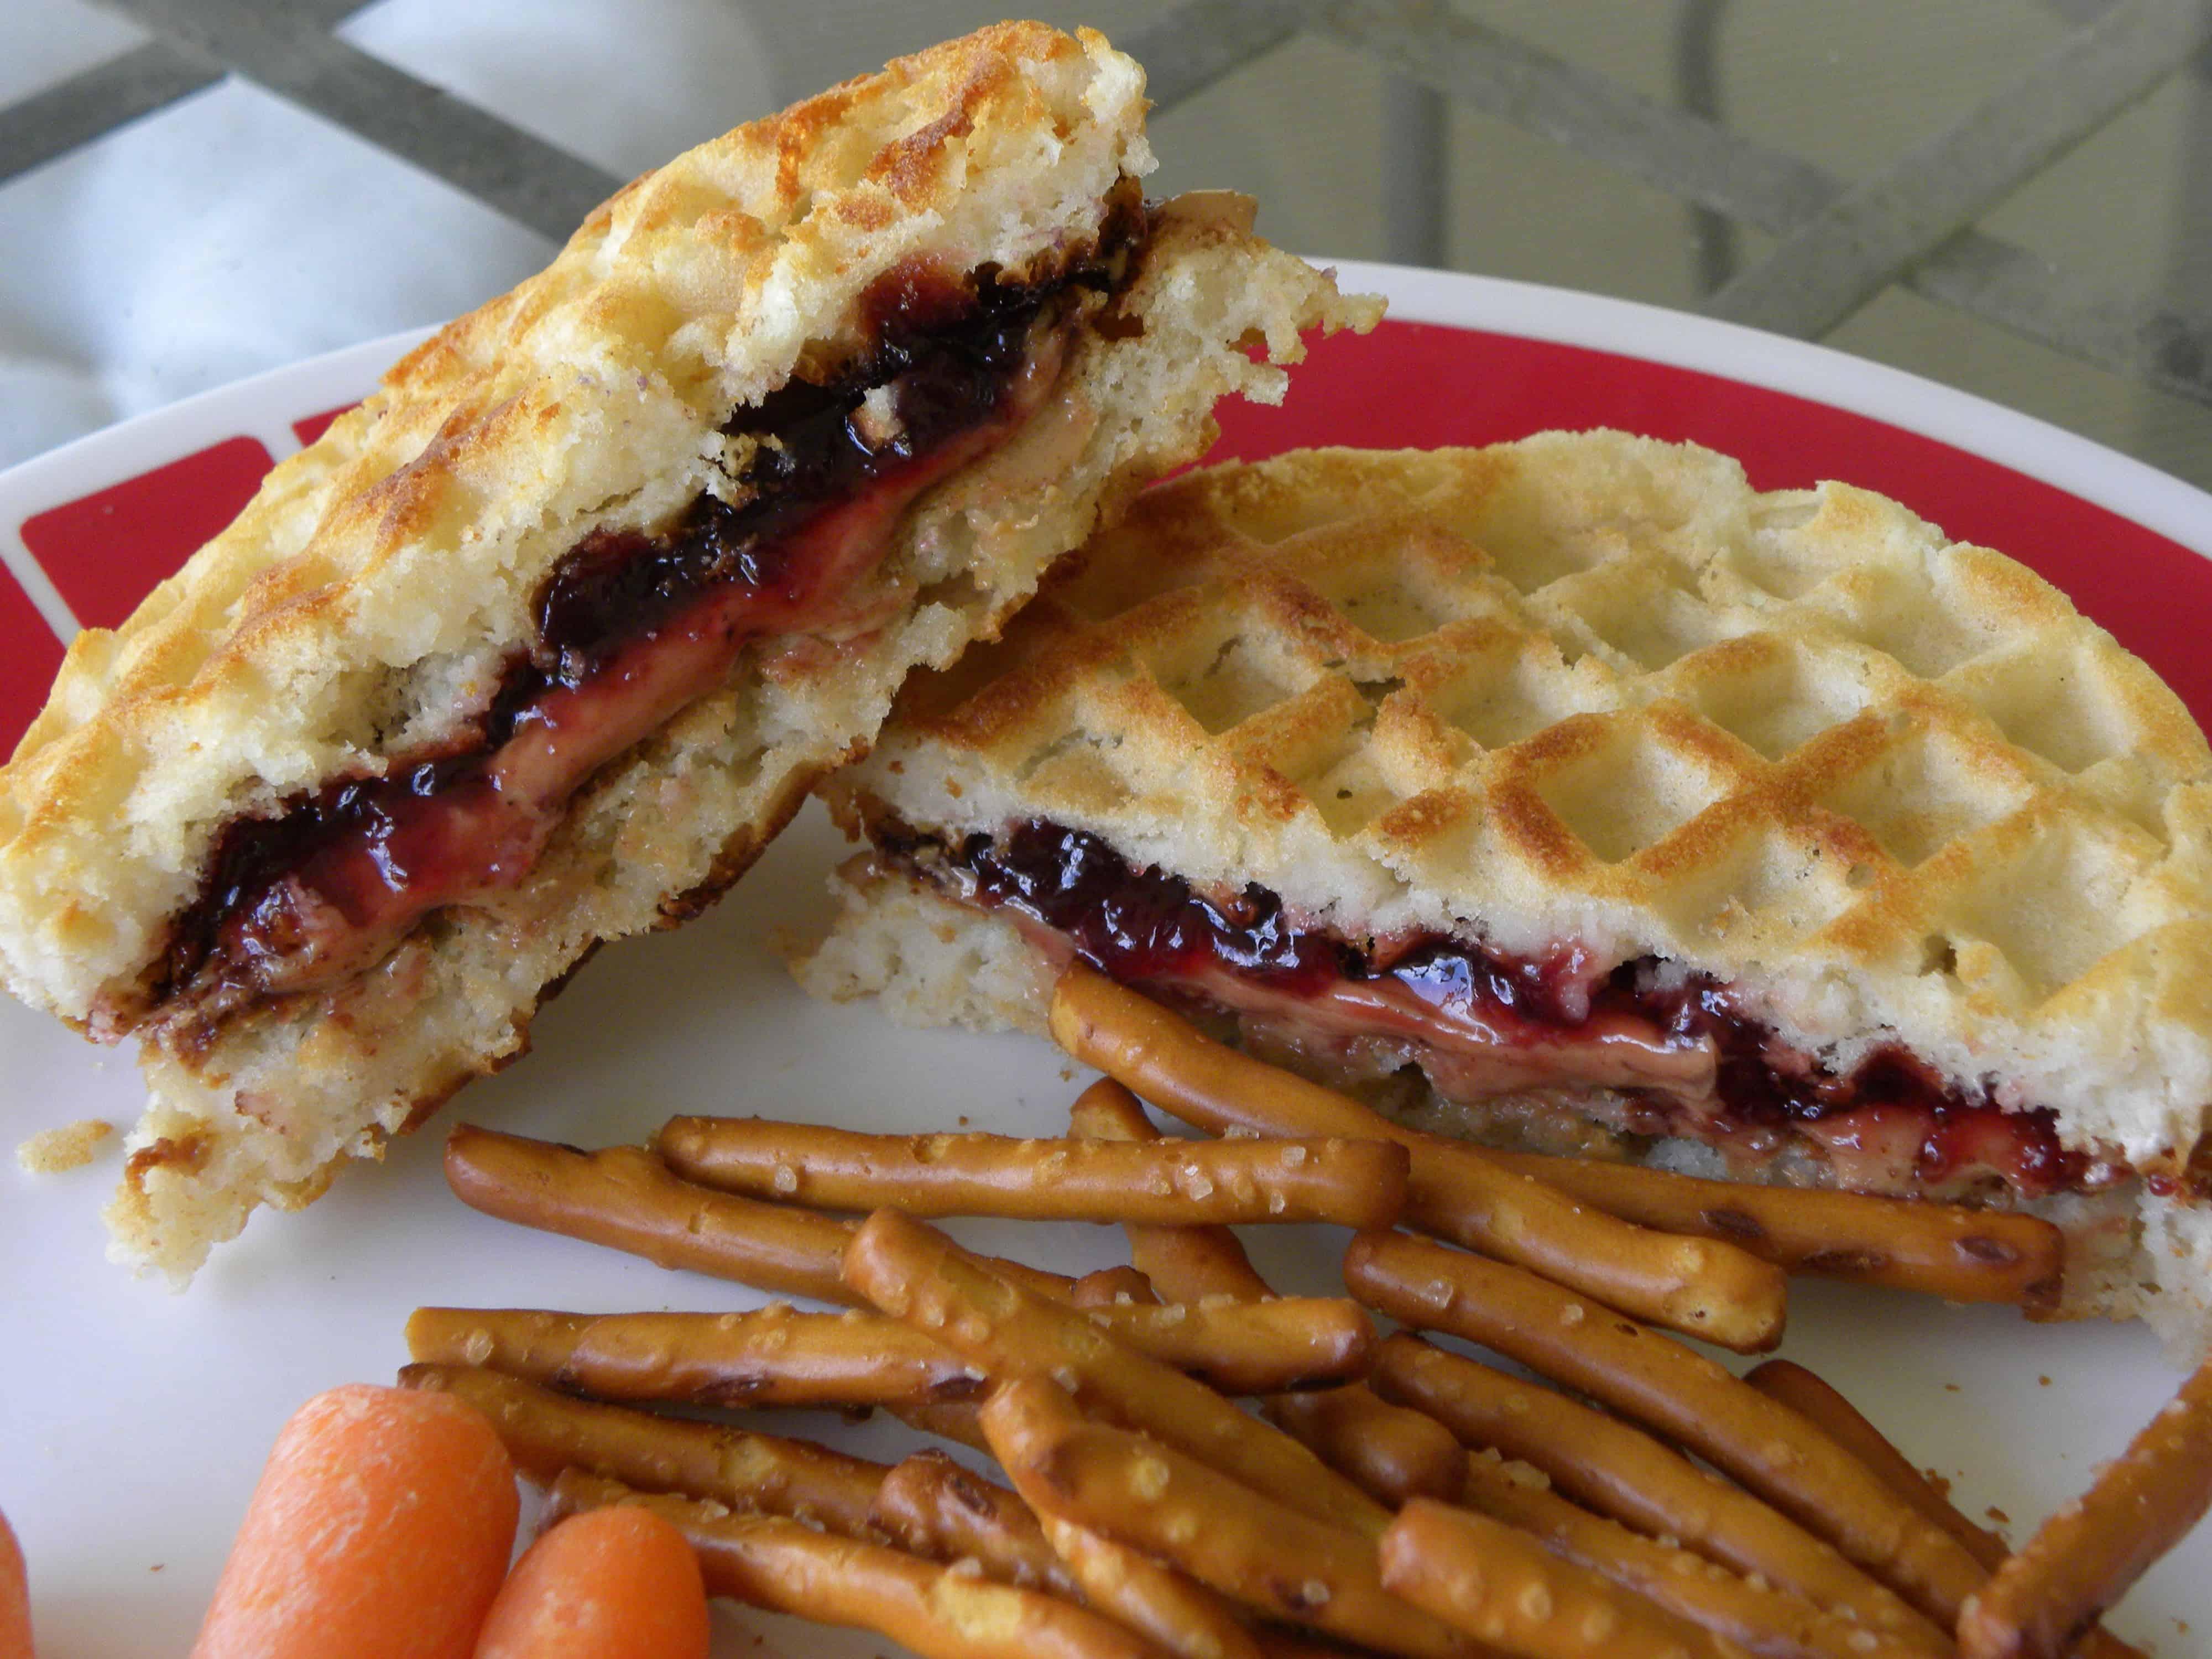 Pb&j waffle sandwich